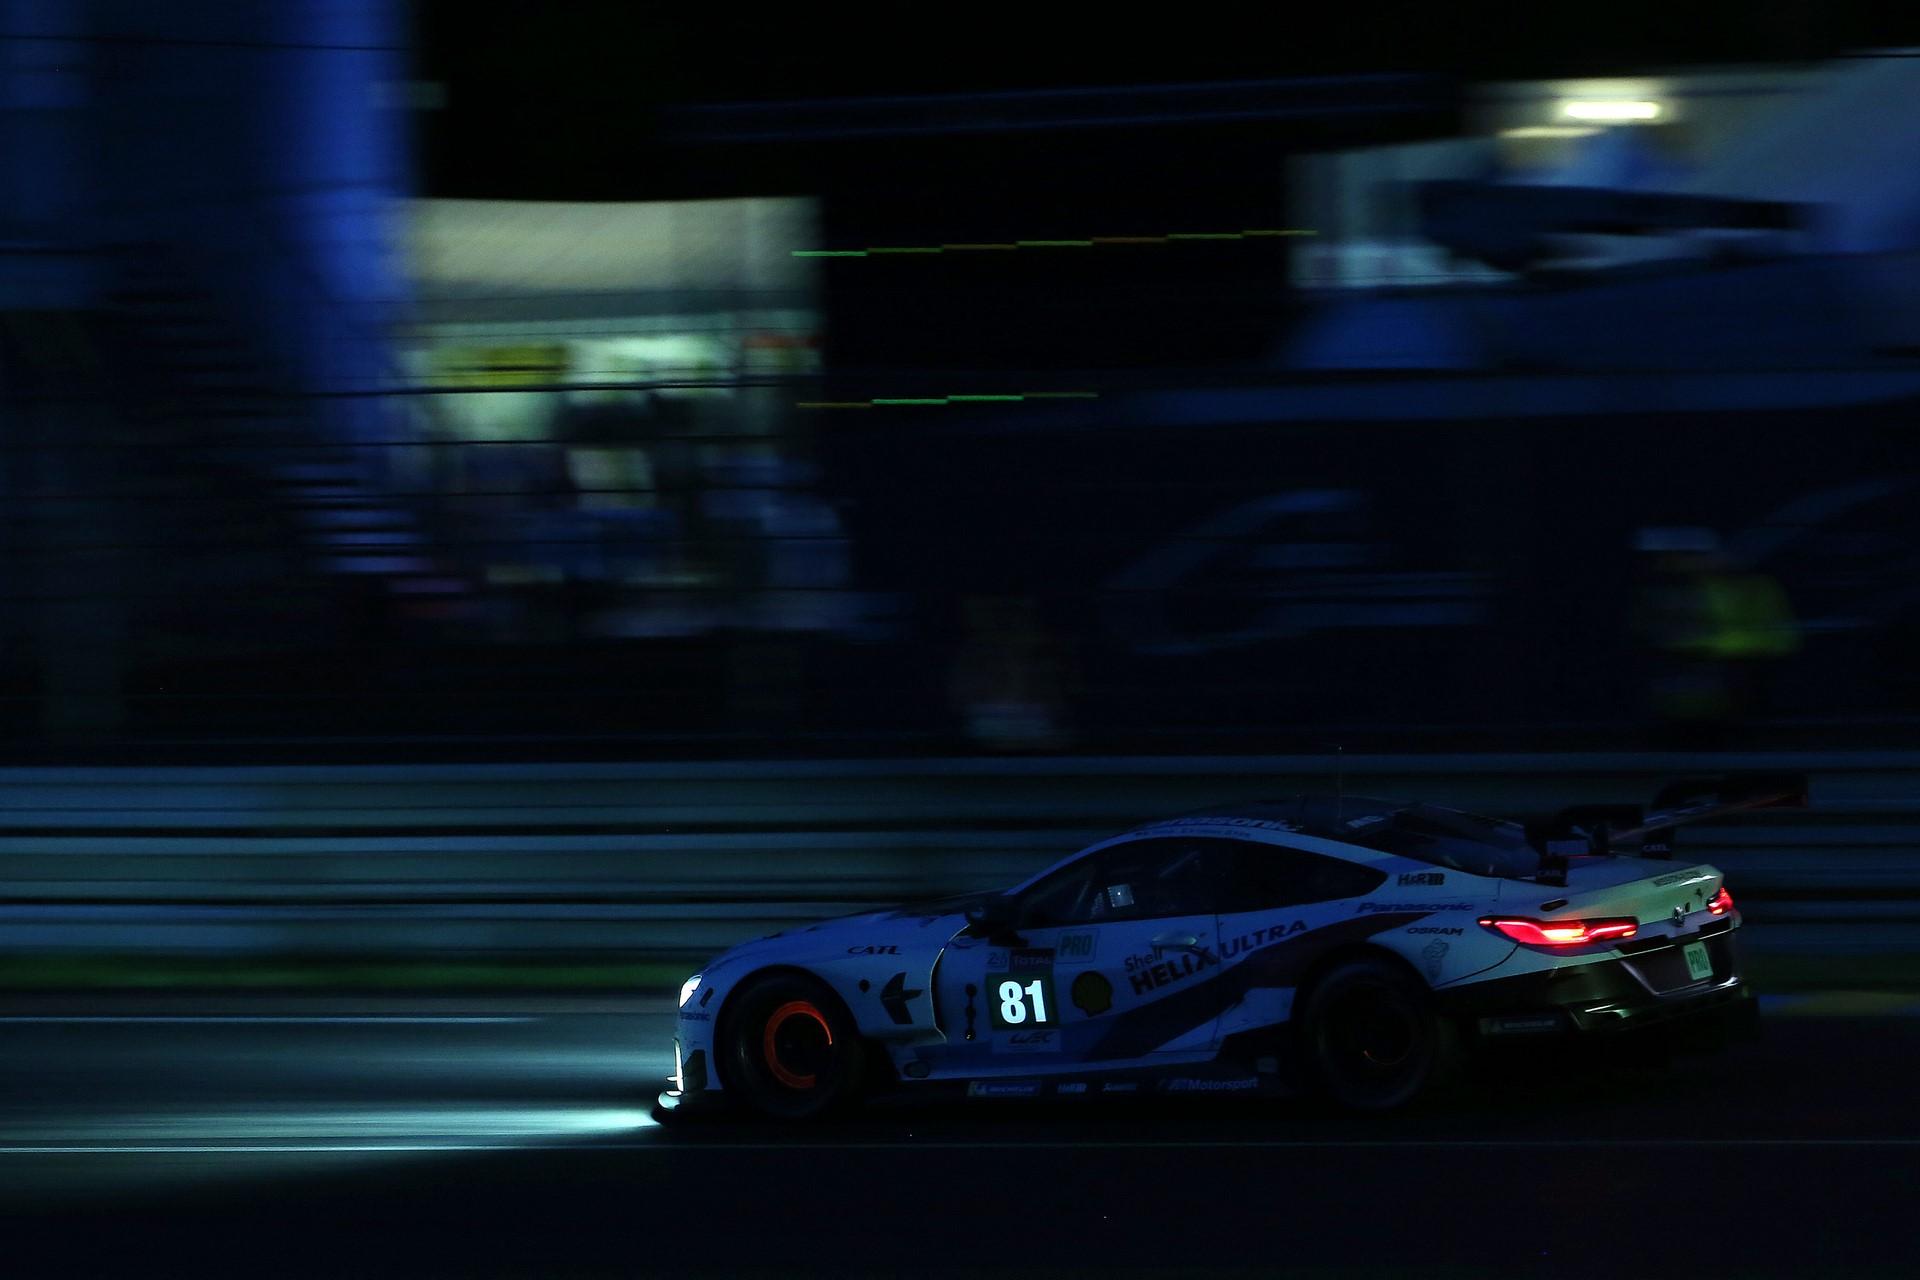 Le Mans (FRA), 16th June 2018. BMW M Motorsport, FIA World Endurance Championship (WEC), 24 Hours of Le Mans, #81 BMW M8 GTE, Martin Tomczyk (GER), Philipp Eng (AUT), Nick Catsburg (NED).